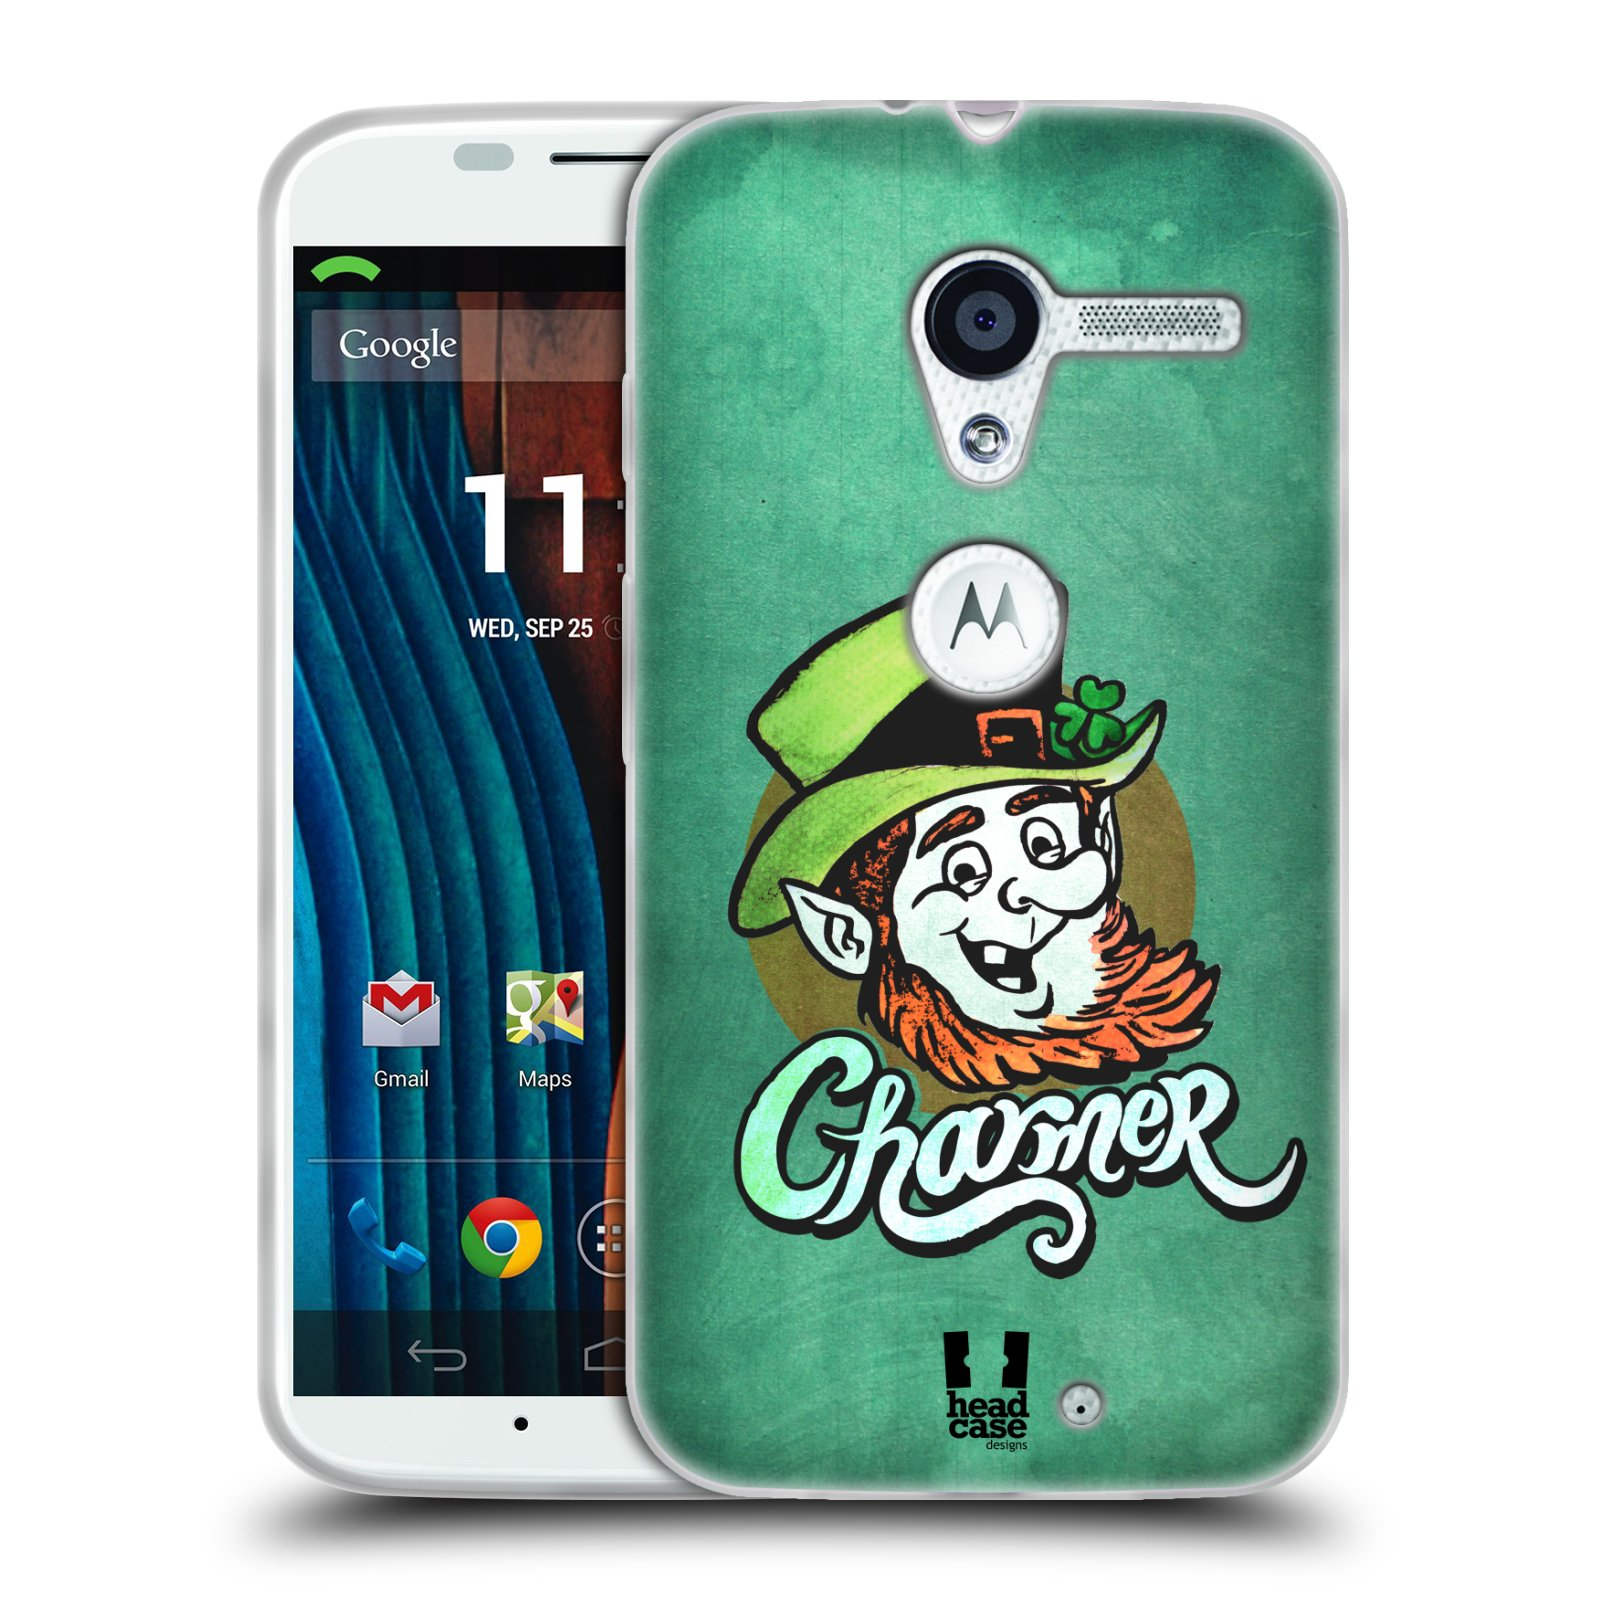 Silikonové pouzdro na mobil Motorola Moto X HEAD CASE CHARMER (Silikonový kryt či obal na mobilní telefon Motorola Moto X)